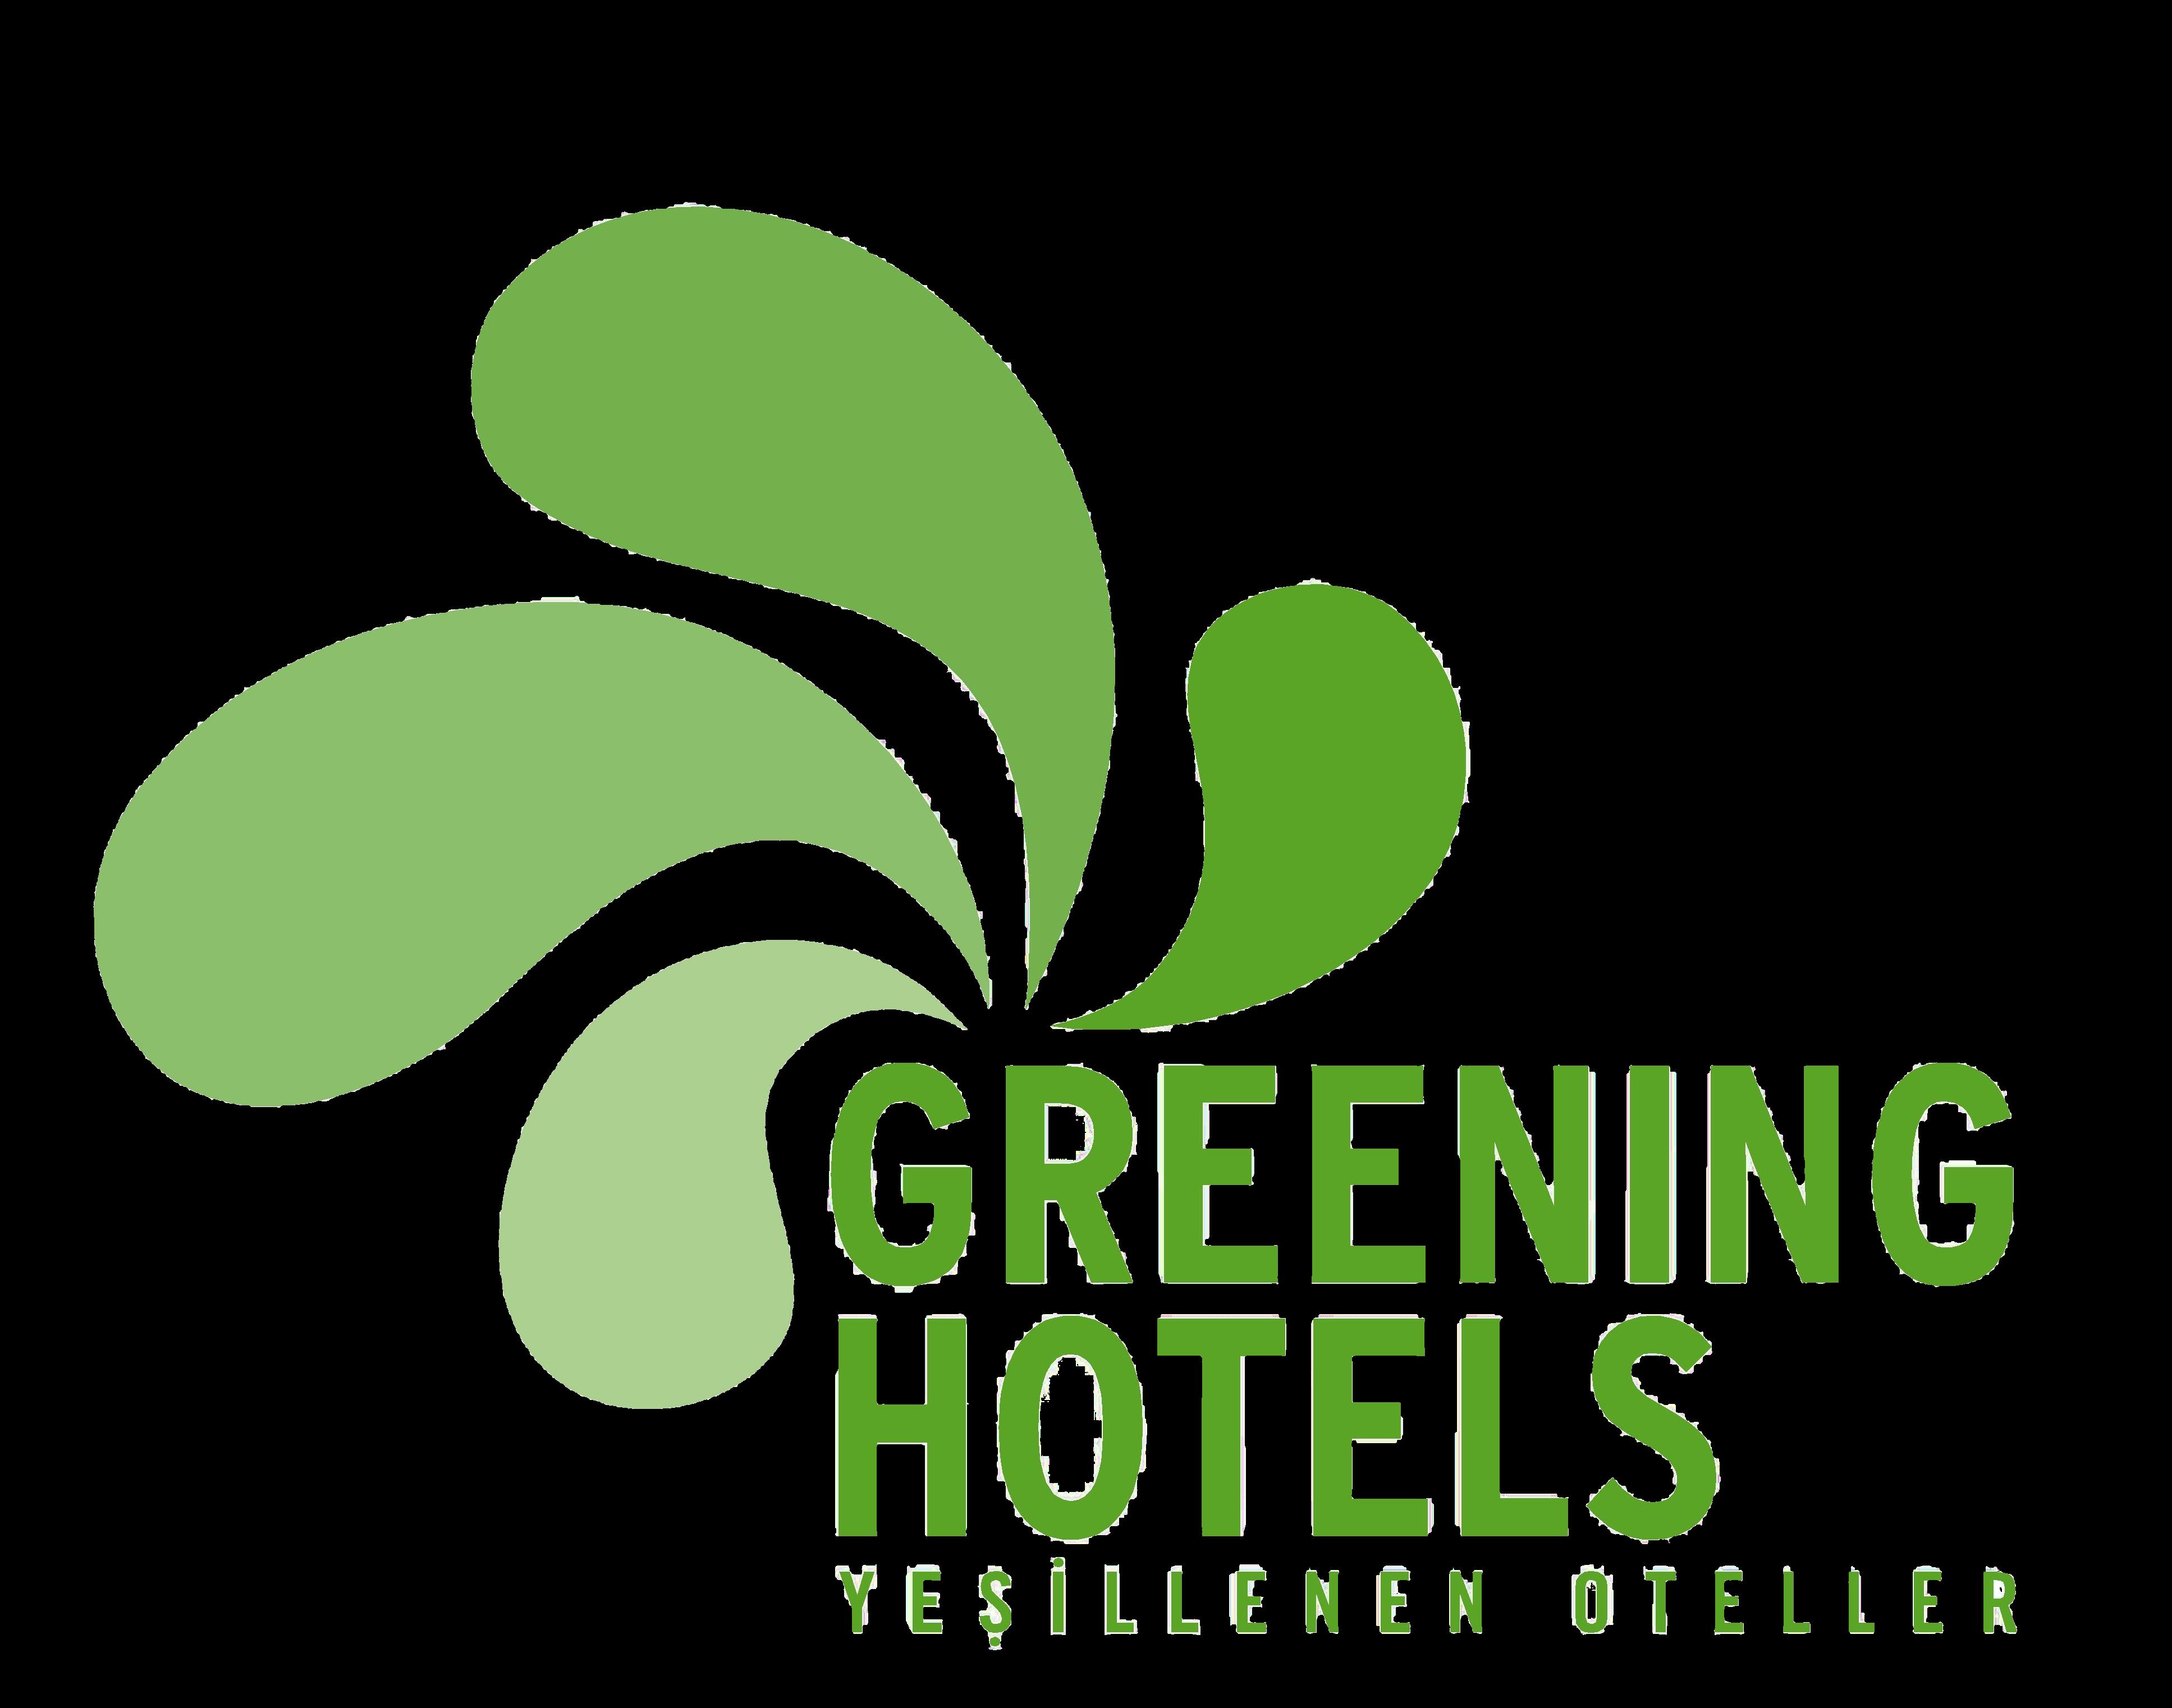 Yeşillenen Oteller (Greening Hotels) Sertifikasyon Projesi